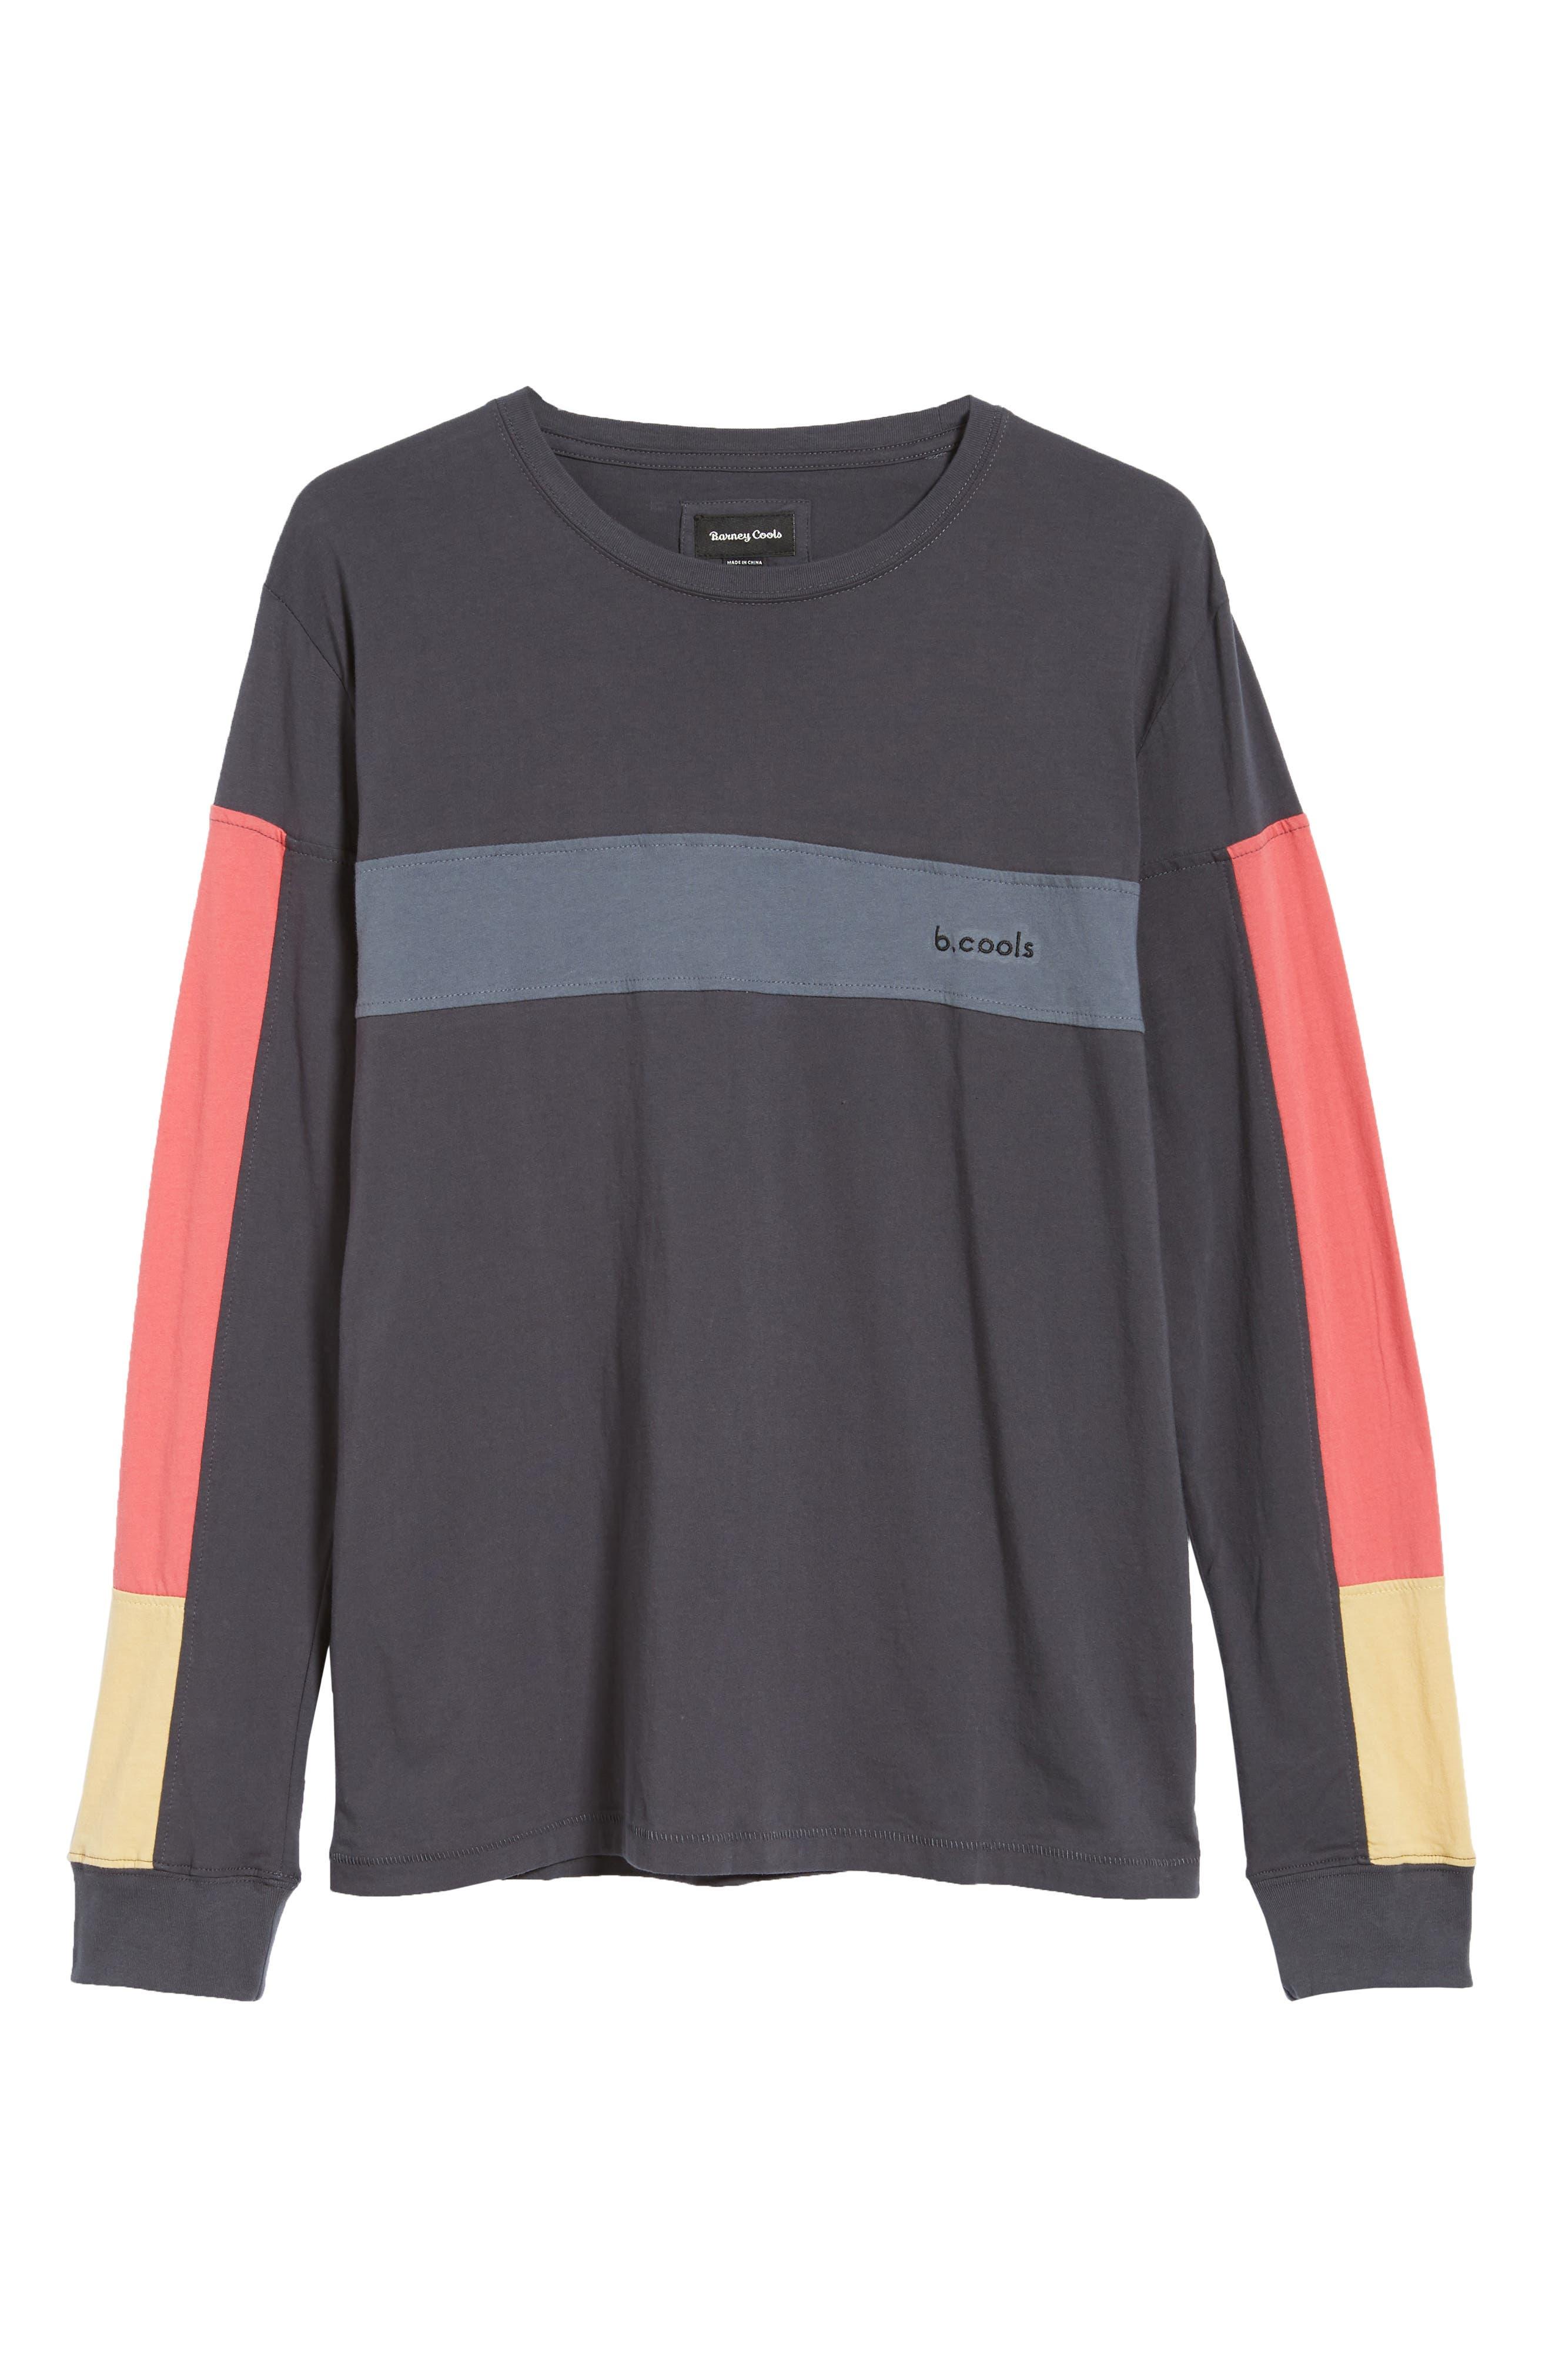 BARNEY COOLS,                             B Quick Colorblock Long Sleeve T-Shirt,                             Alternate thumbnail 6, color,                             001